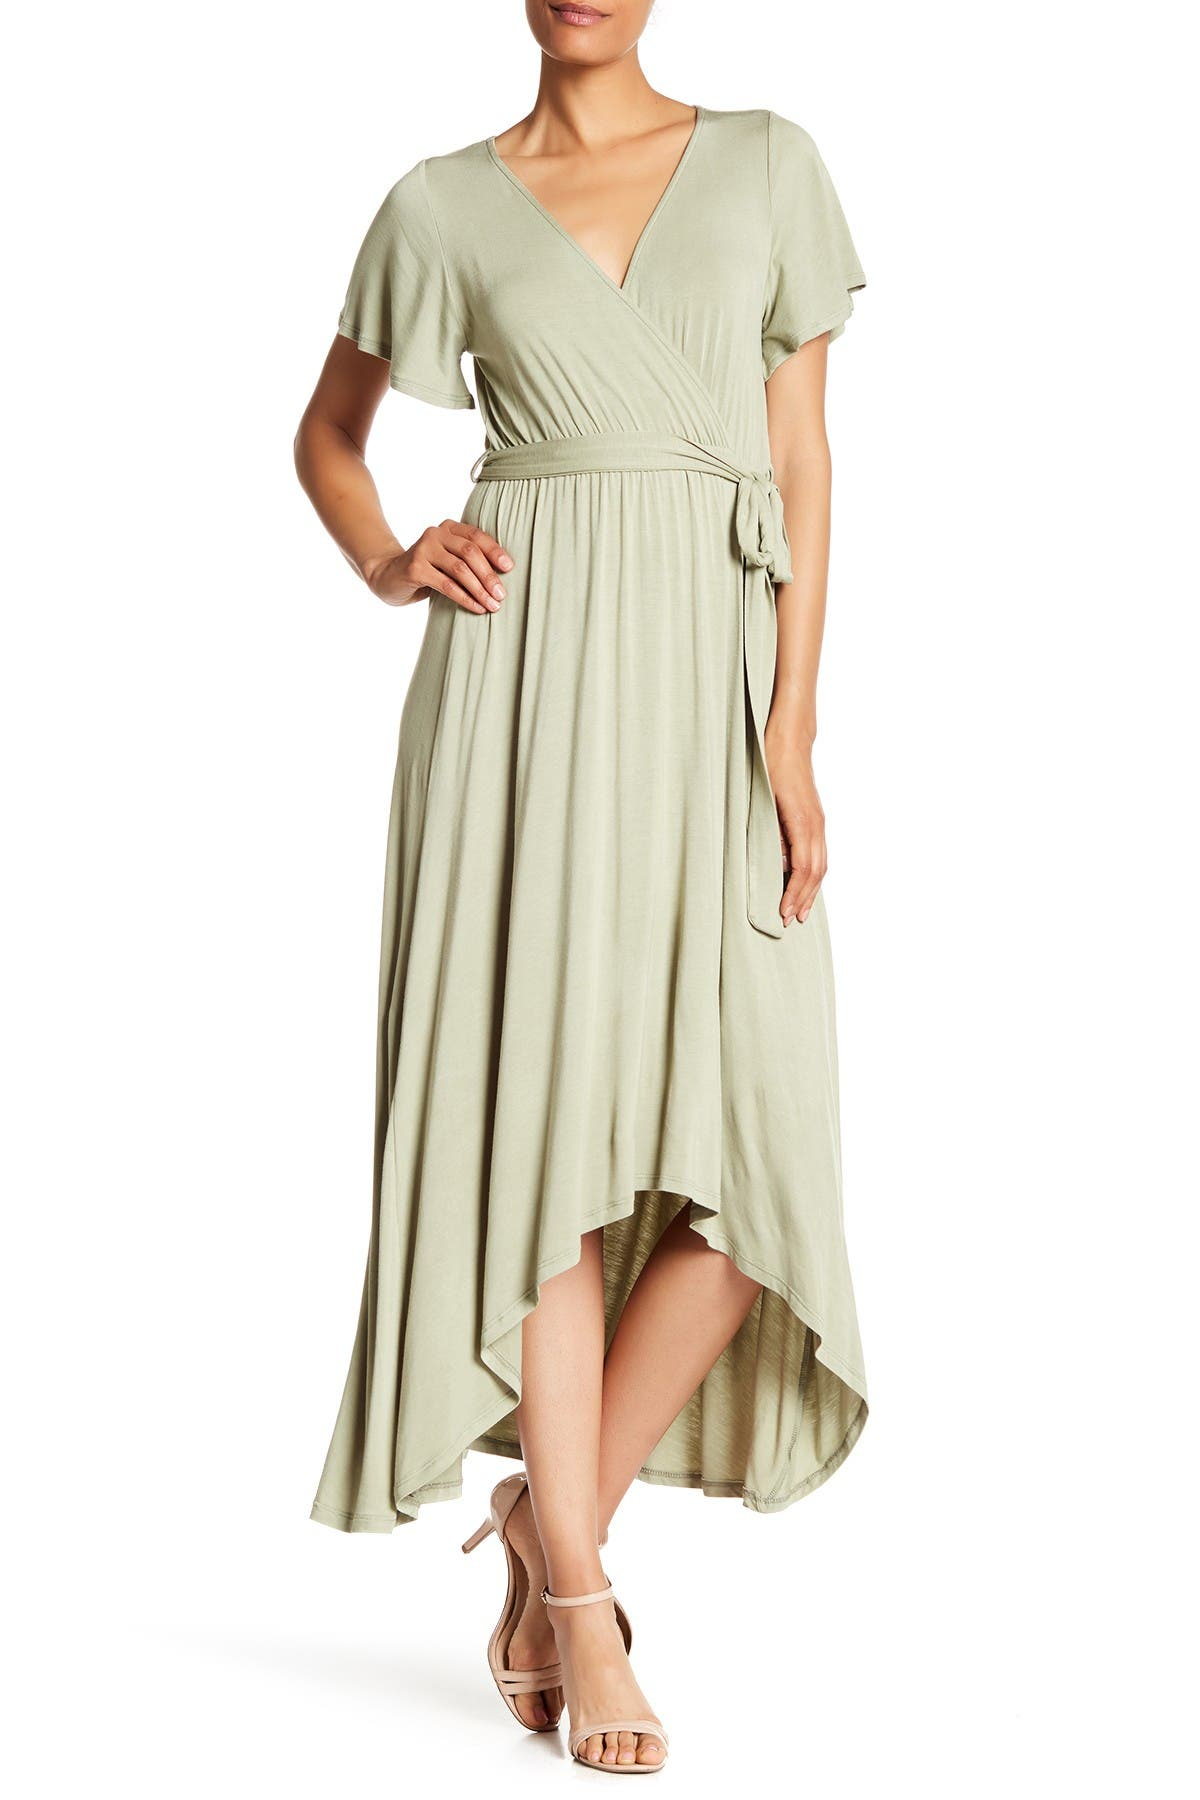 Image of WEST KEI Flutter Sleeve High/Low Wrap Dress